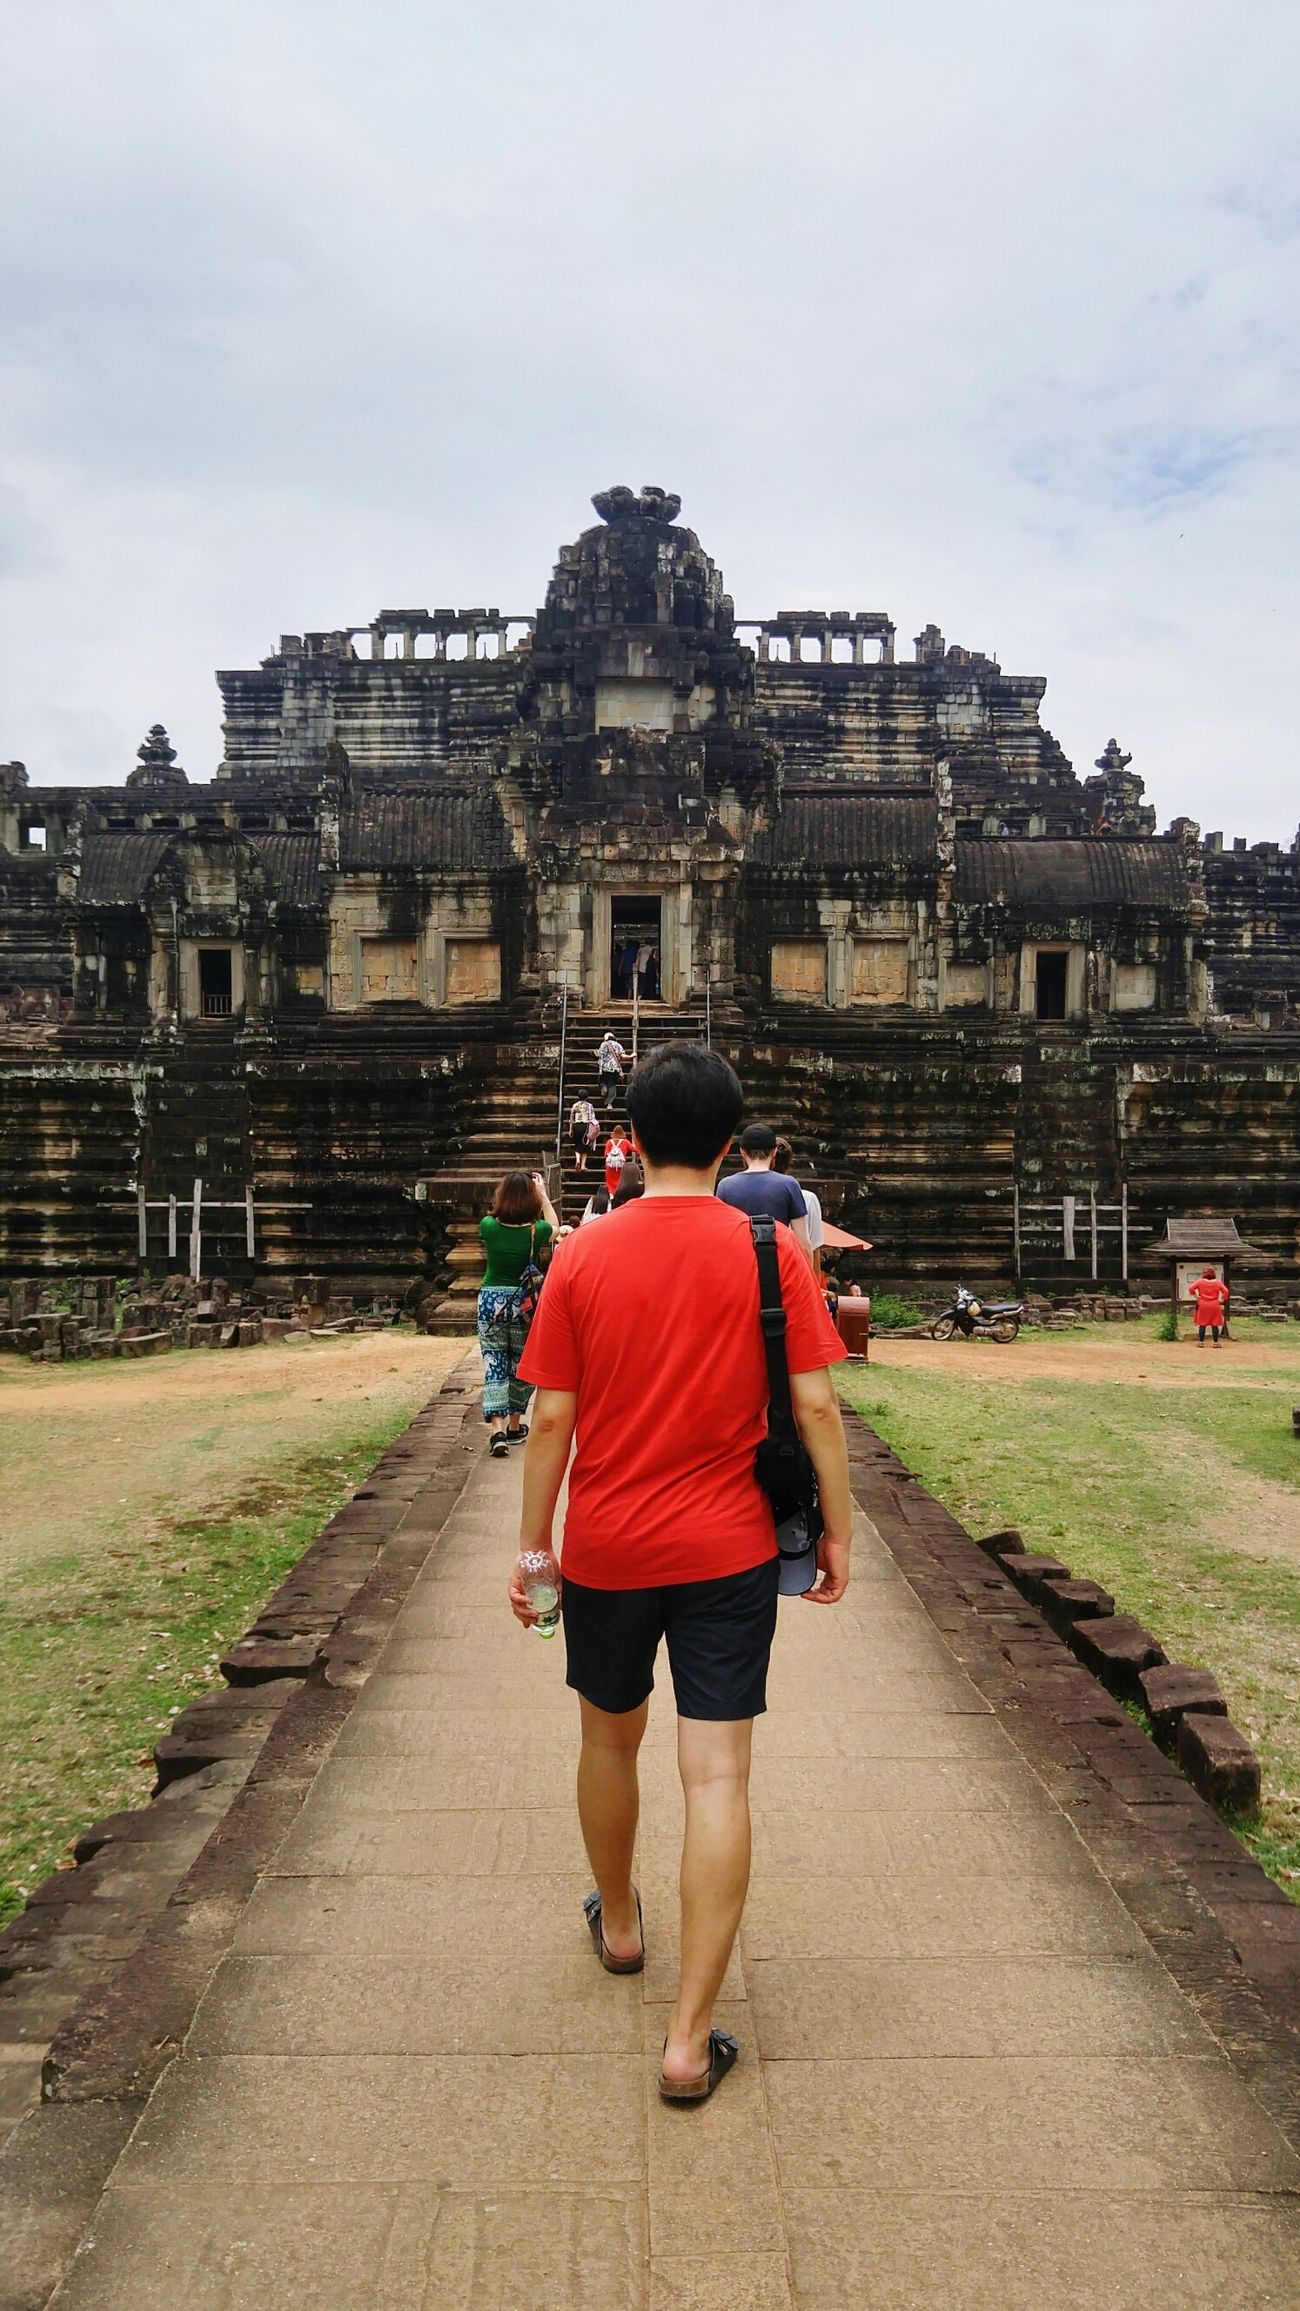 Angkor Wat Angkor Thom Cambodia Khmer Architecture Angkorwat Temple Journey